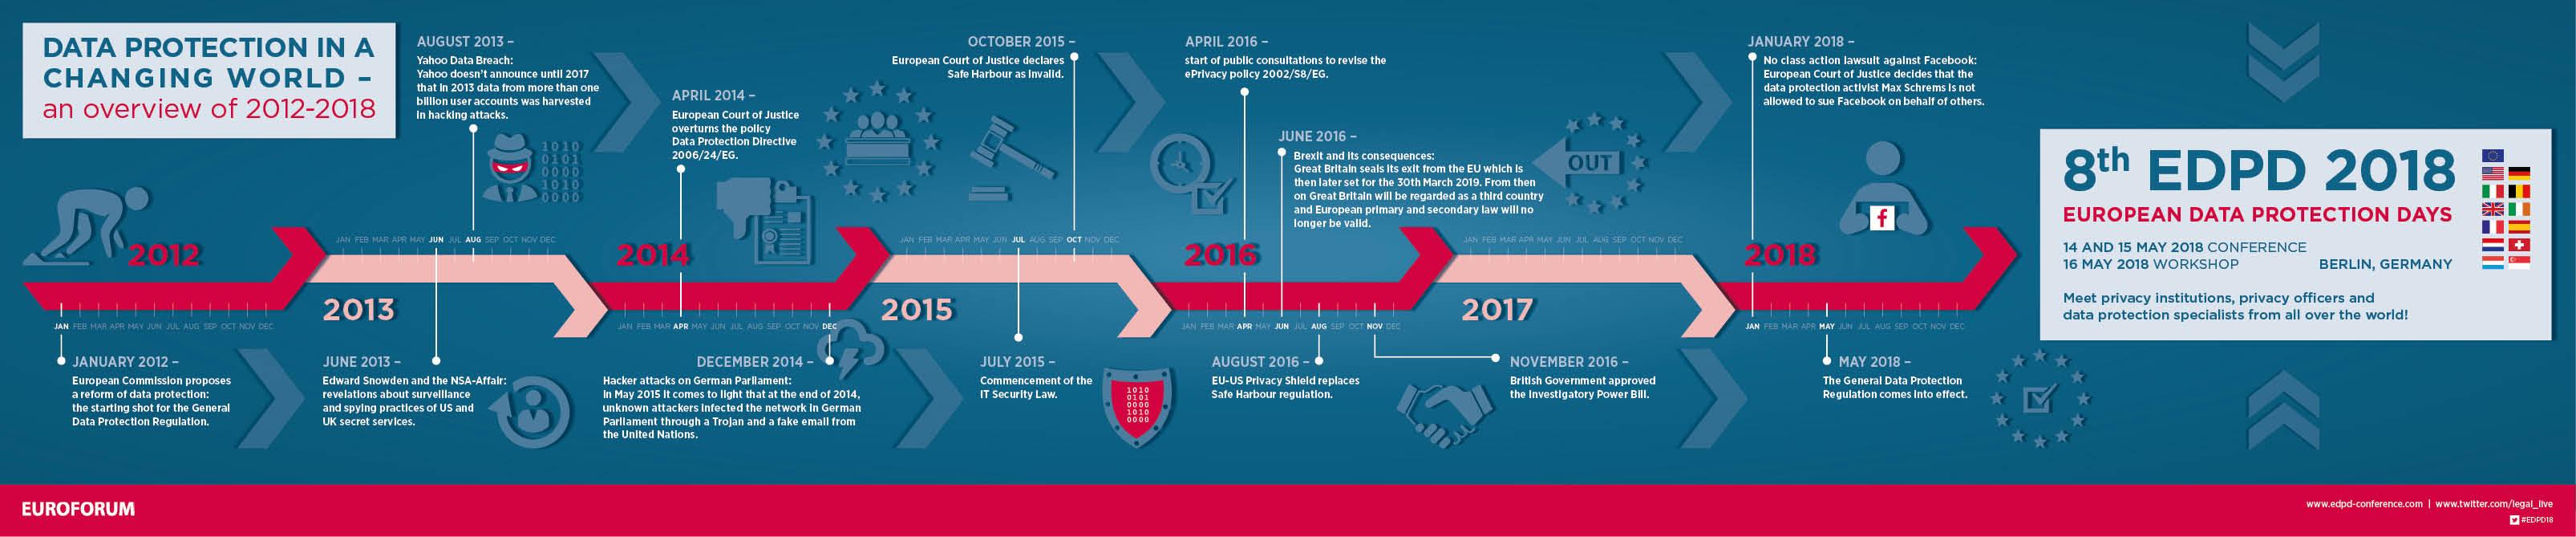 path to gdpr timeline